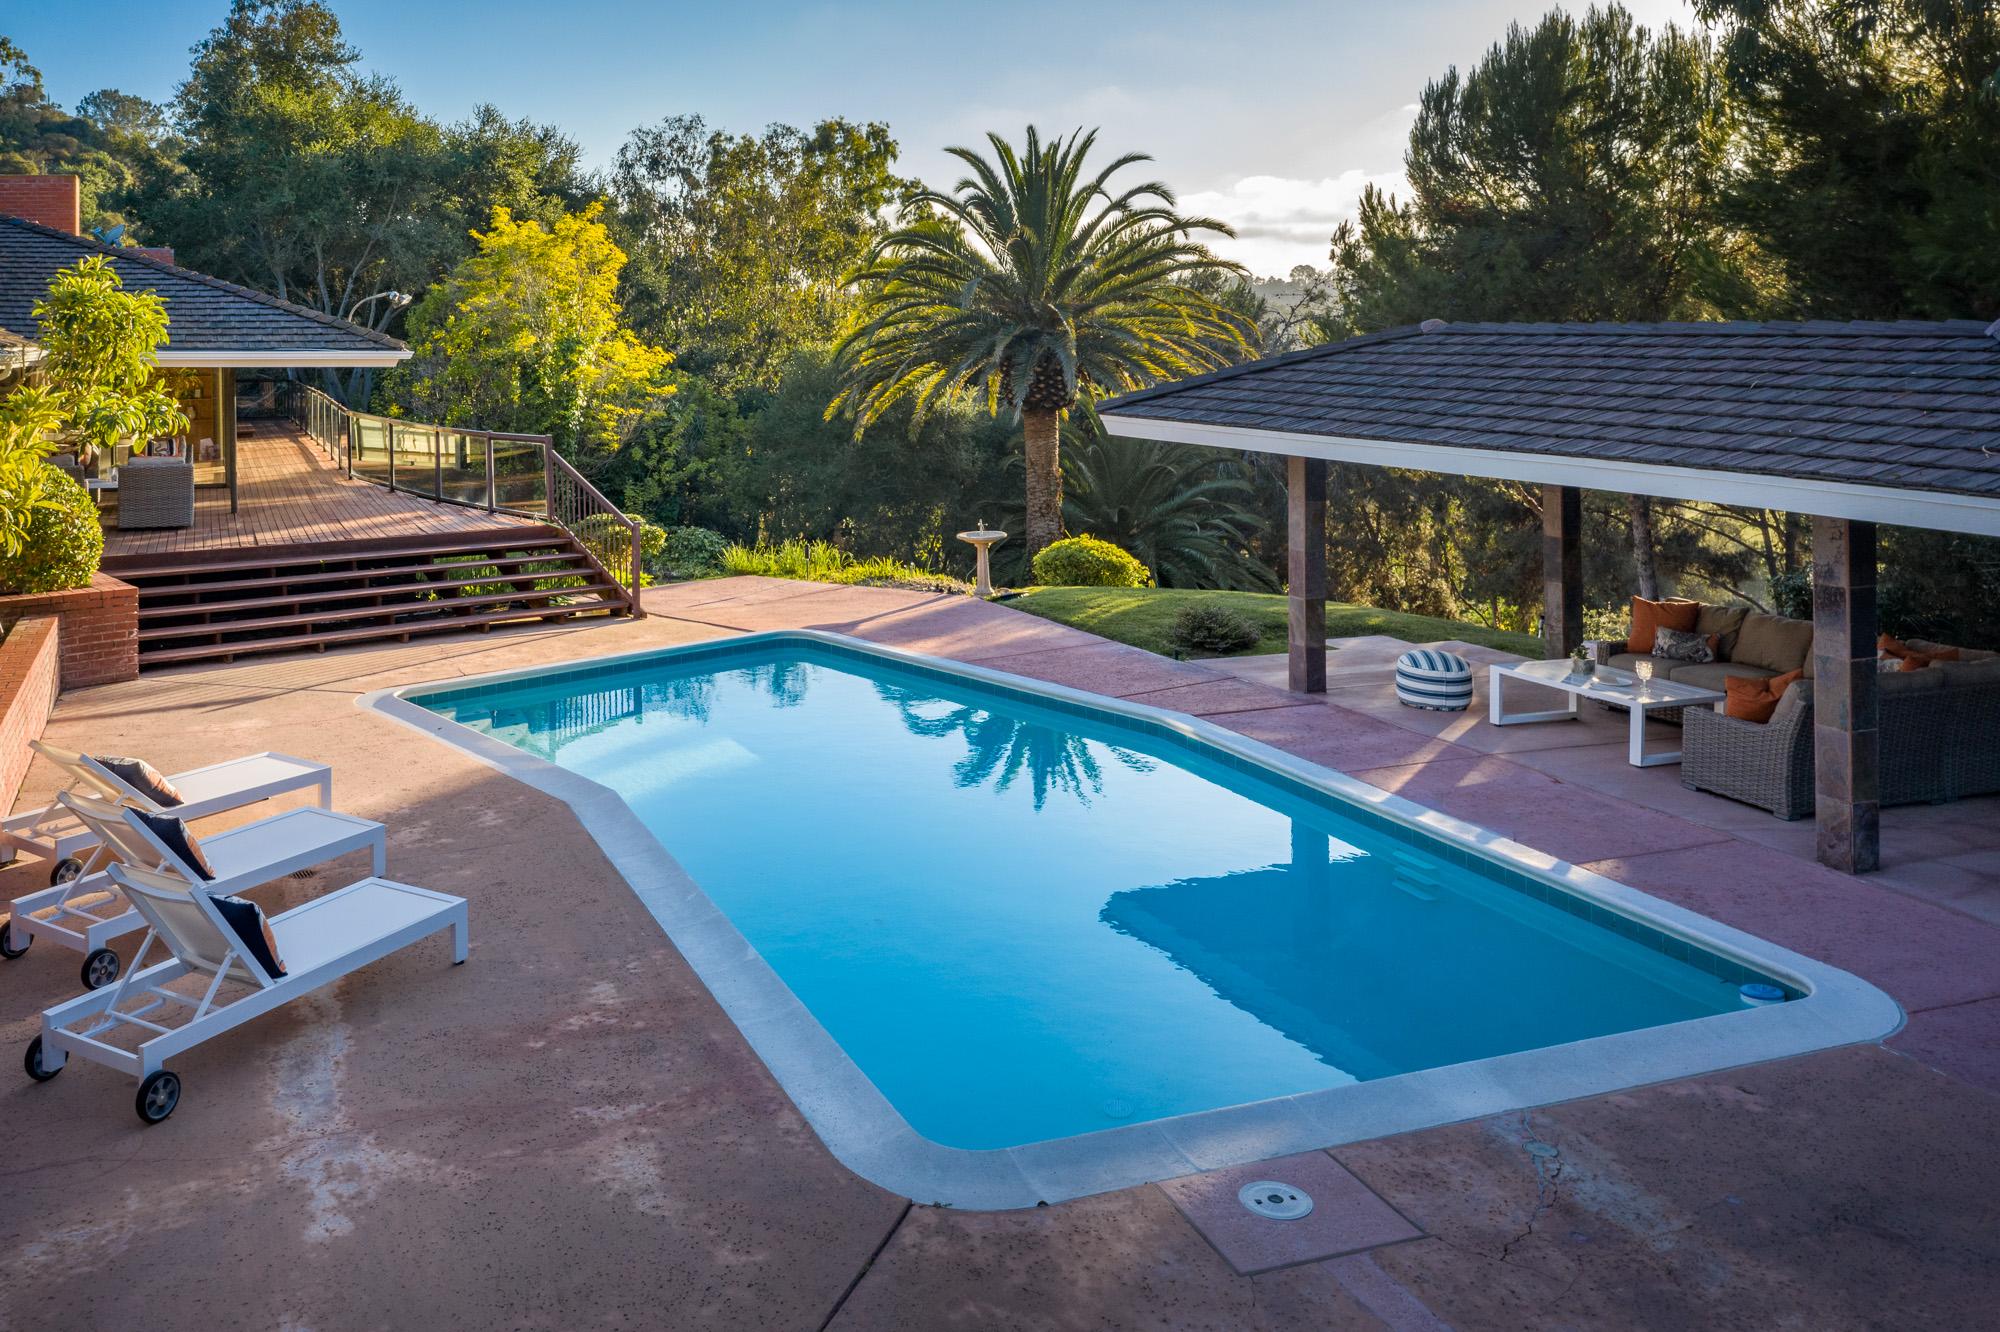 Sold 2020 Laura Represented Seller -  Rancho Santa Fe, CA 92067